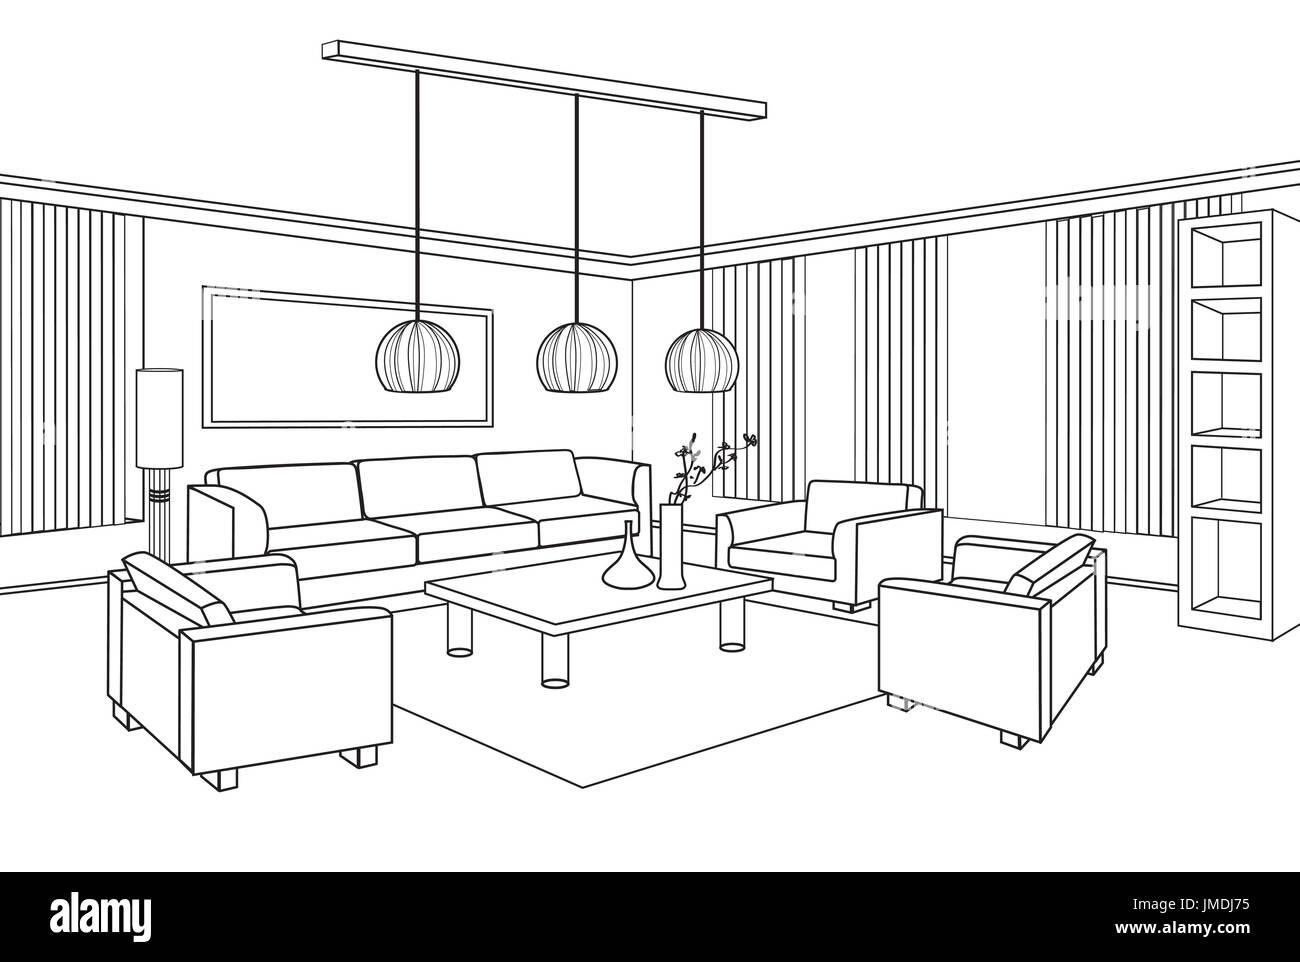 Living room view. Interior outline sketch. Furniture blueprint ...